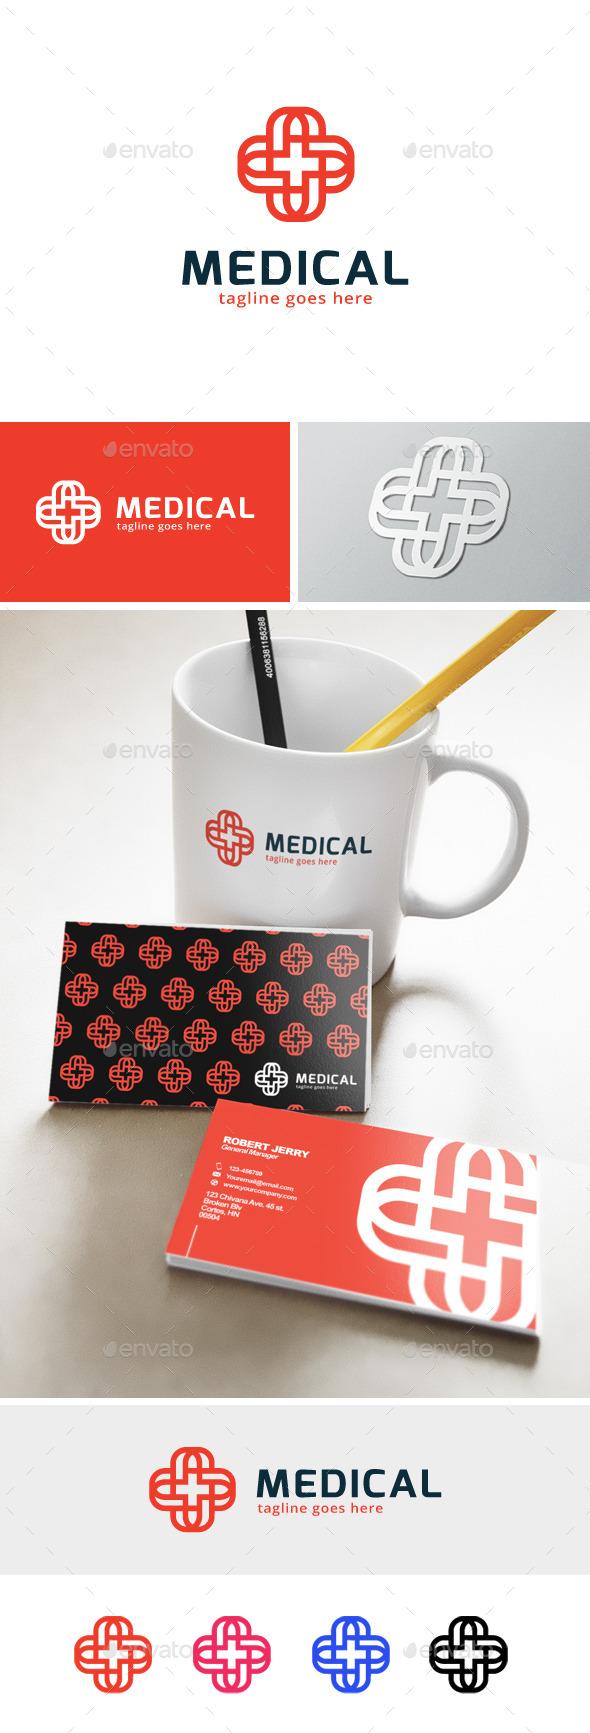 Medical Plus Logo - Abstract Logo Templates